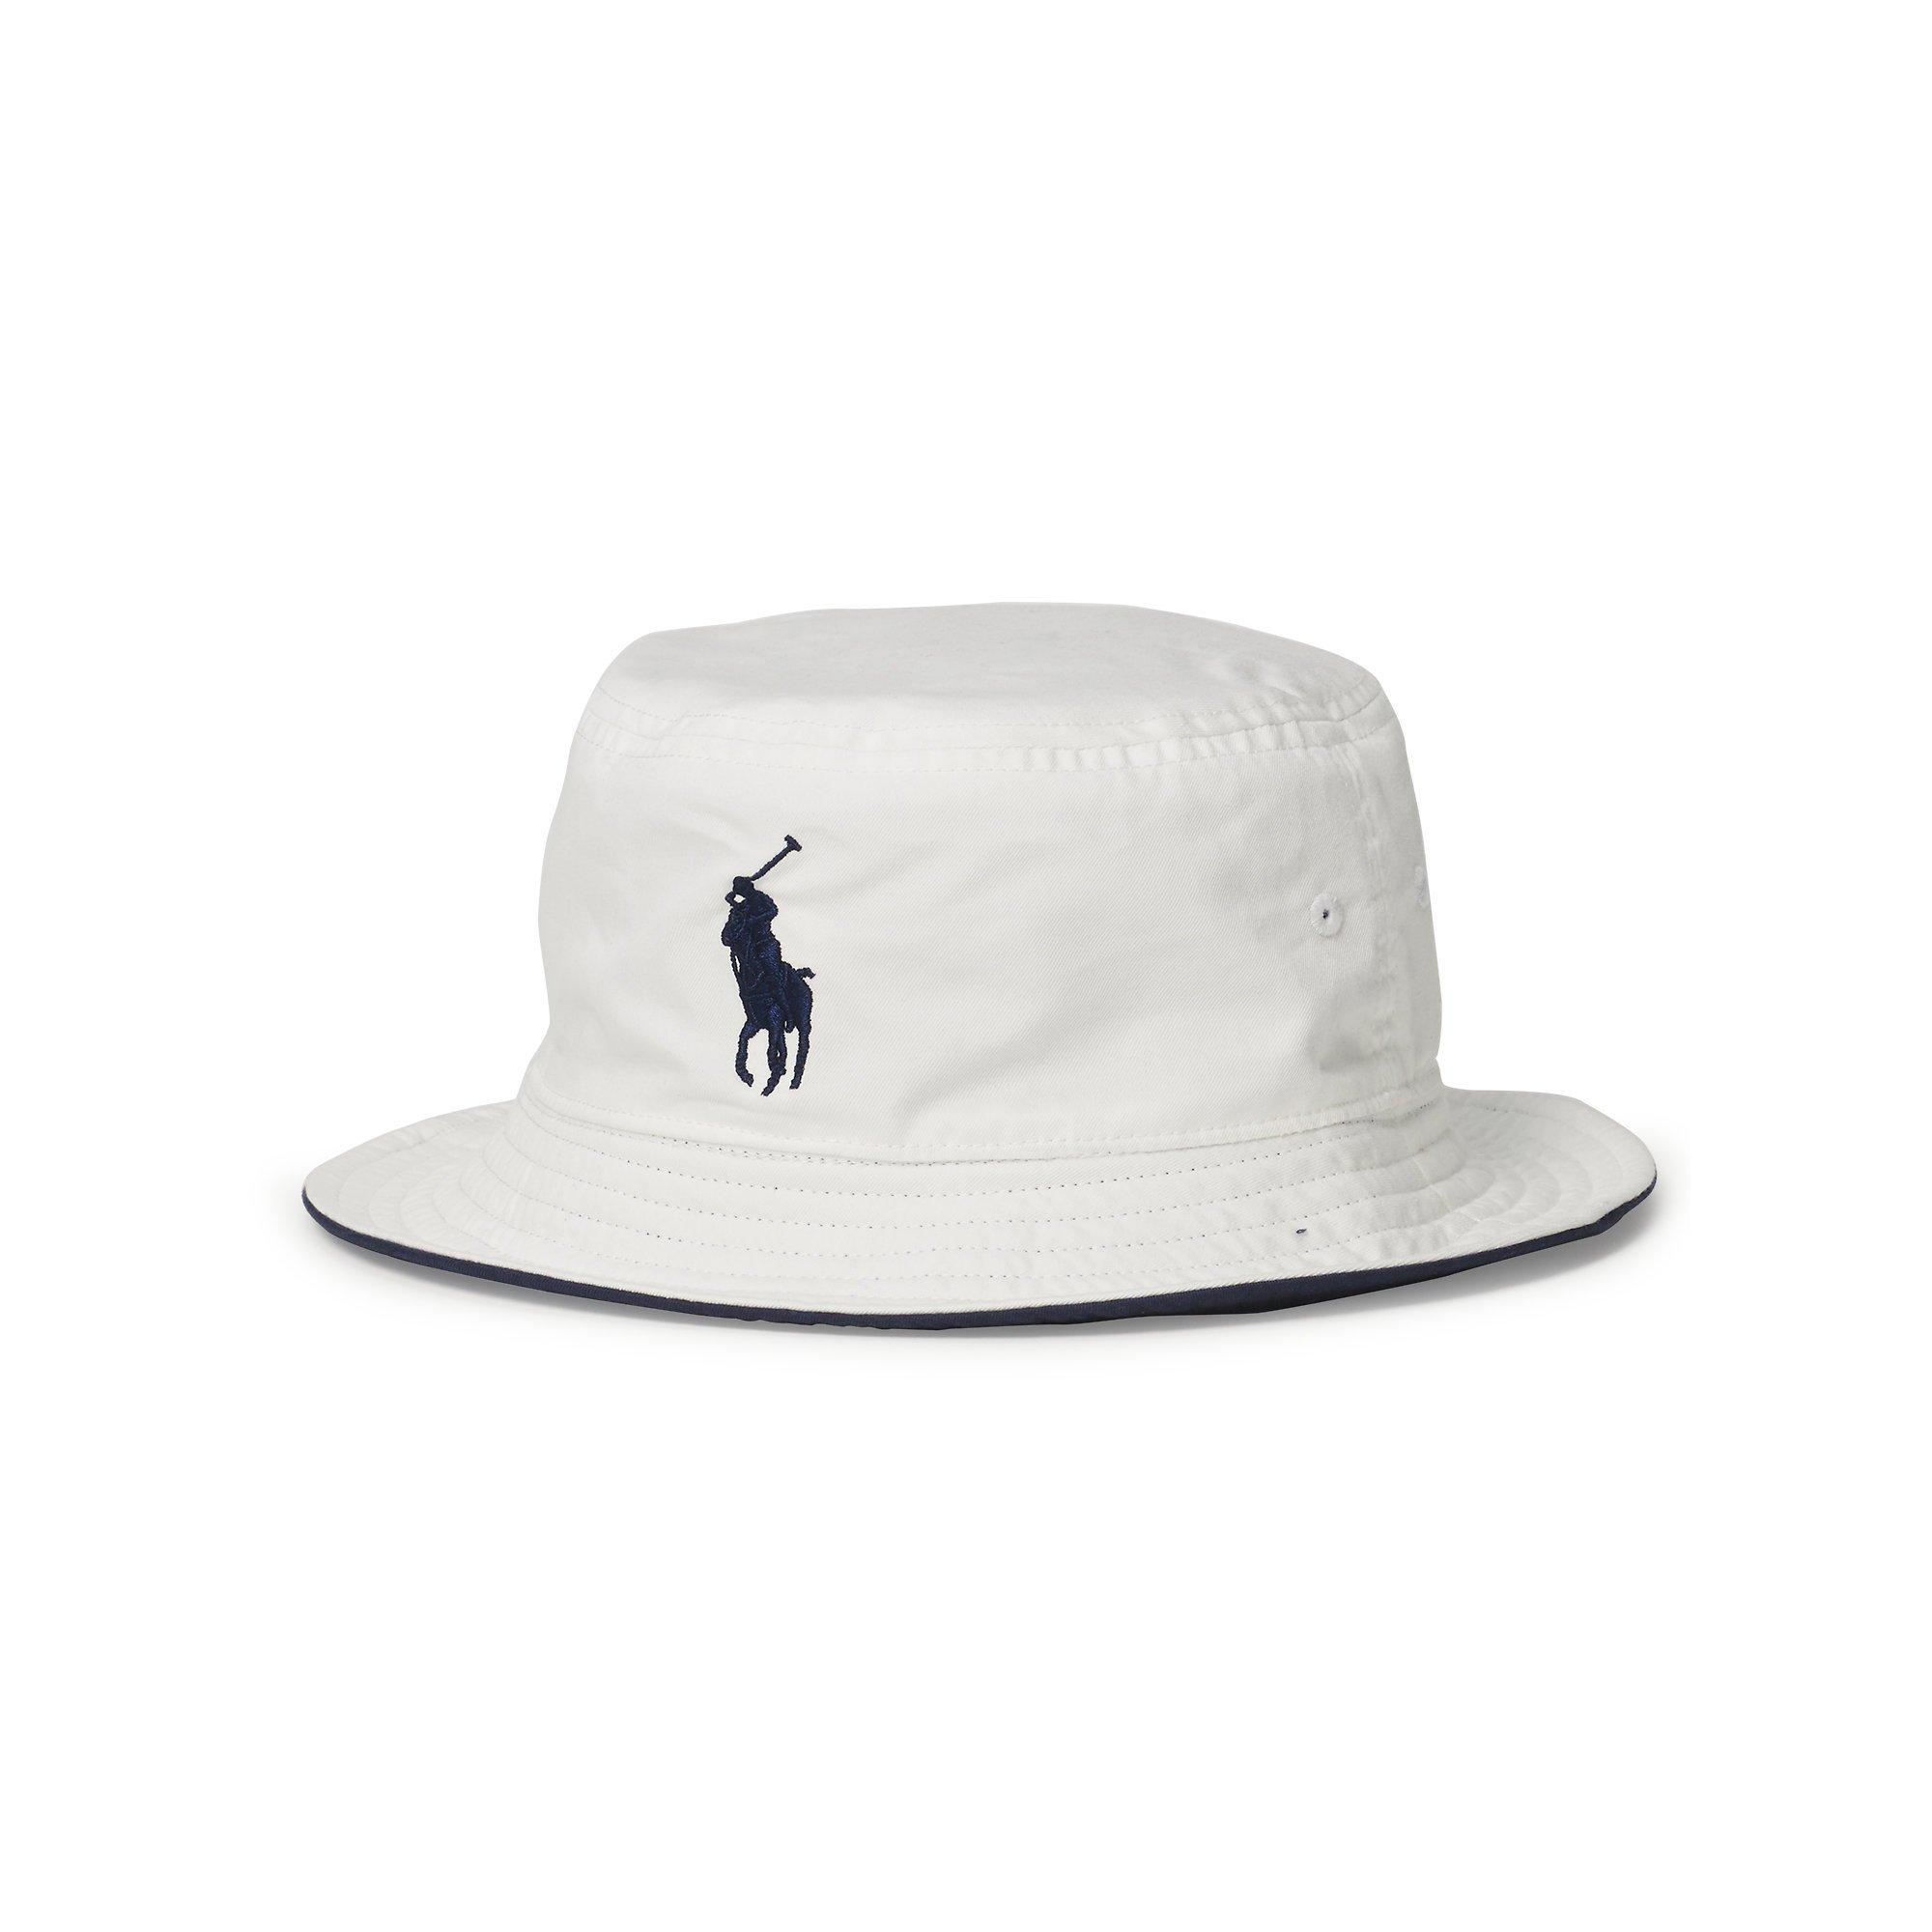 0dee36a2 Polo Us Open Tennis Hat – Rockwall Auction